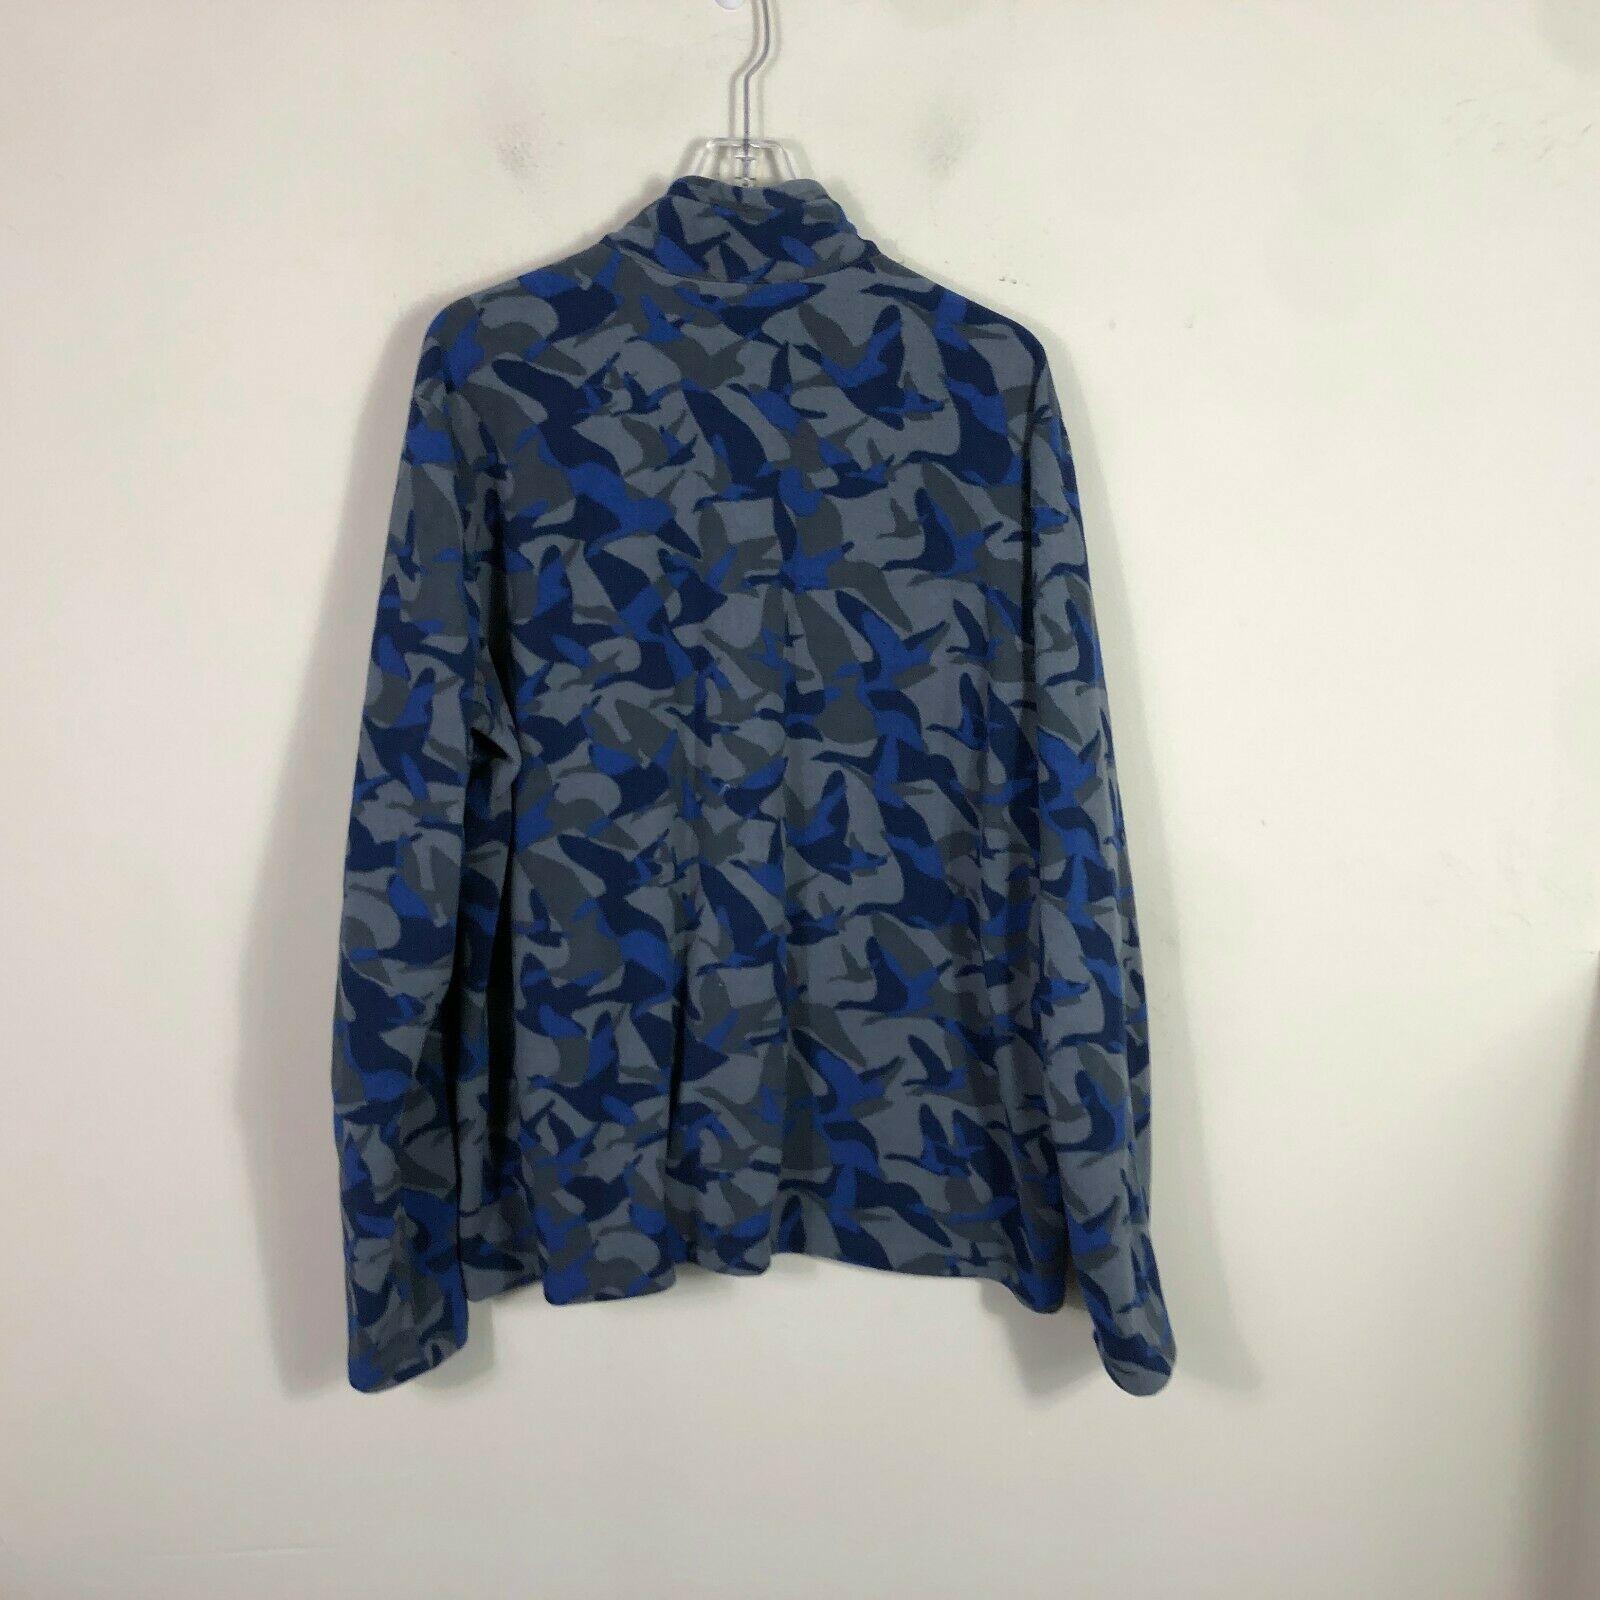 Eddie Bauer First Ascent Fleece Jacket 1/2 Zip Men's 2XL Blue Gray Long Sleeve image 9